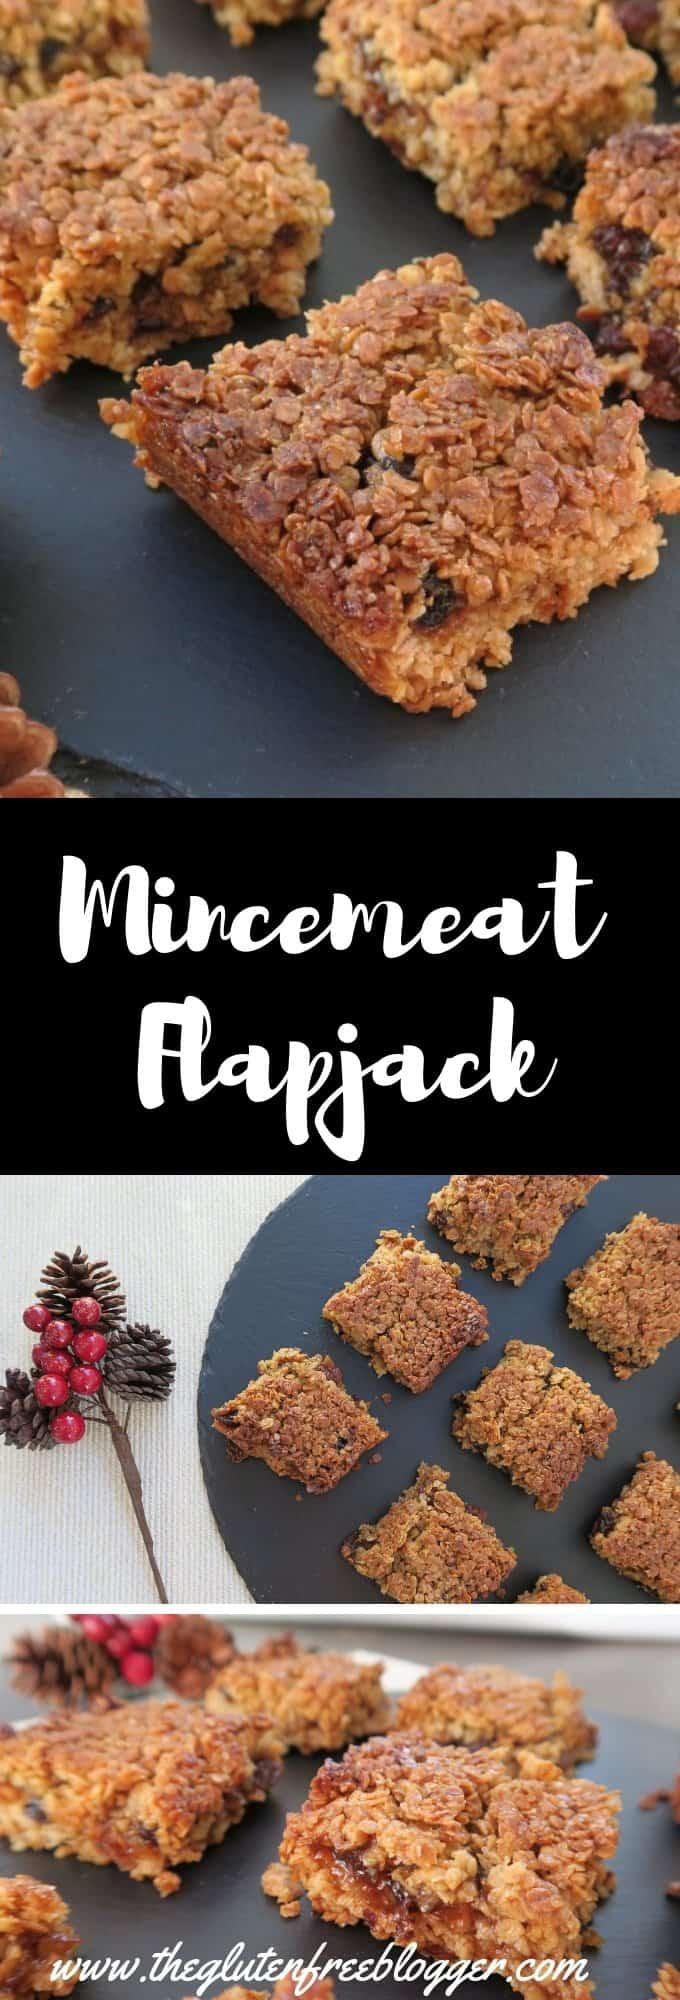 gluten free mincemeat flapjack - christmas recipe - gluten free christmas - coeliac